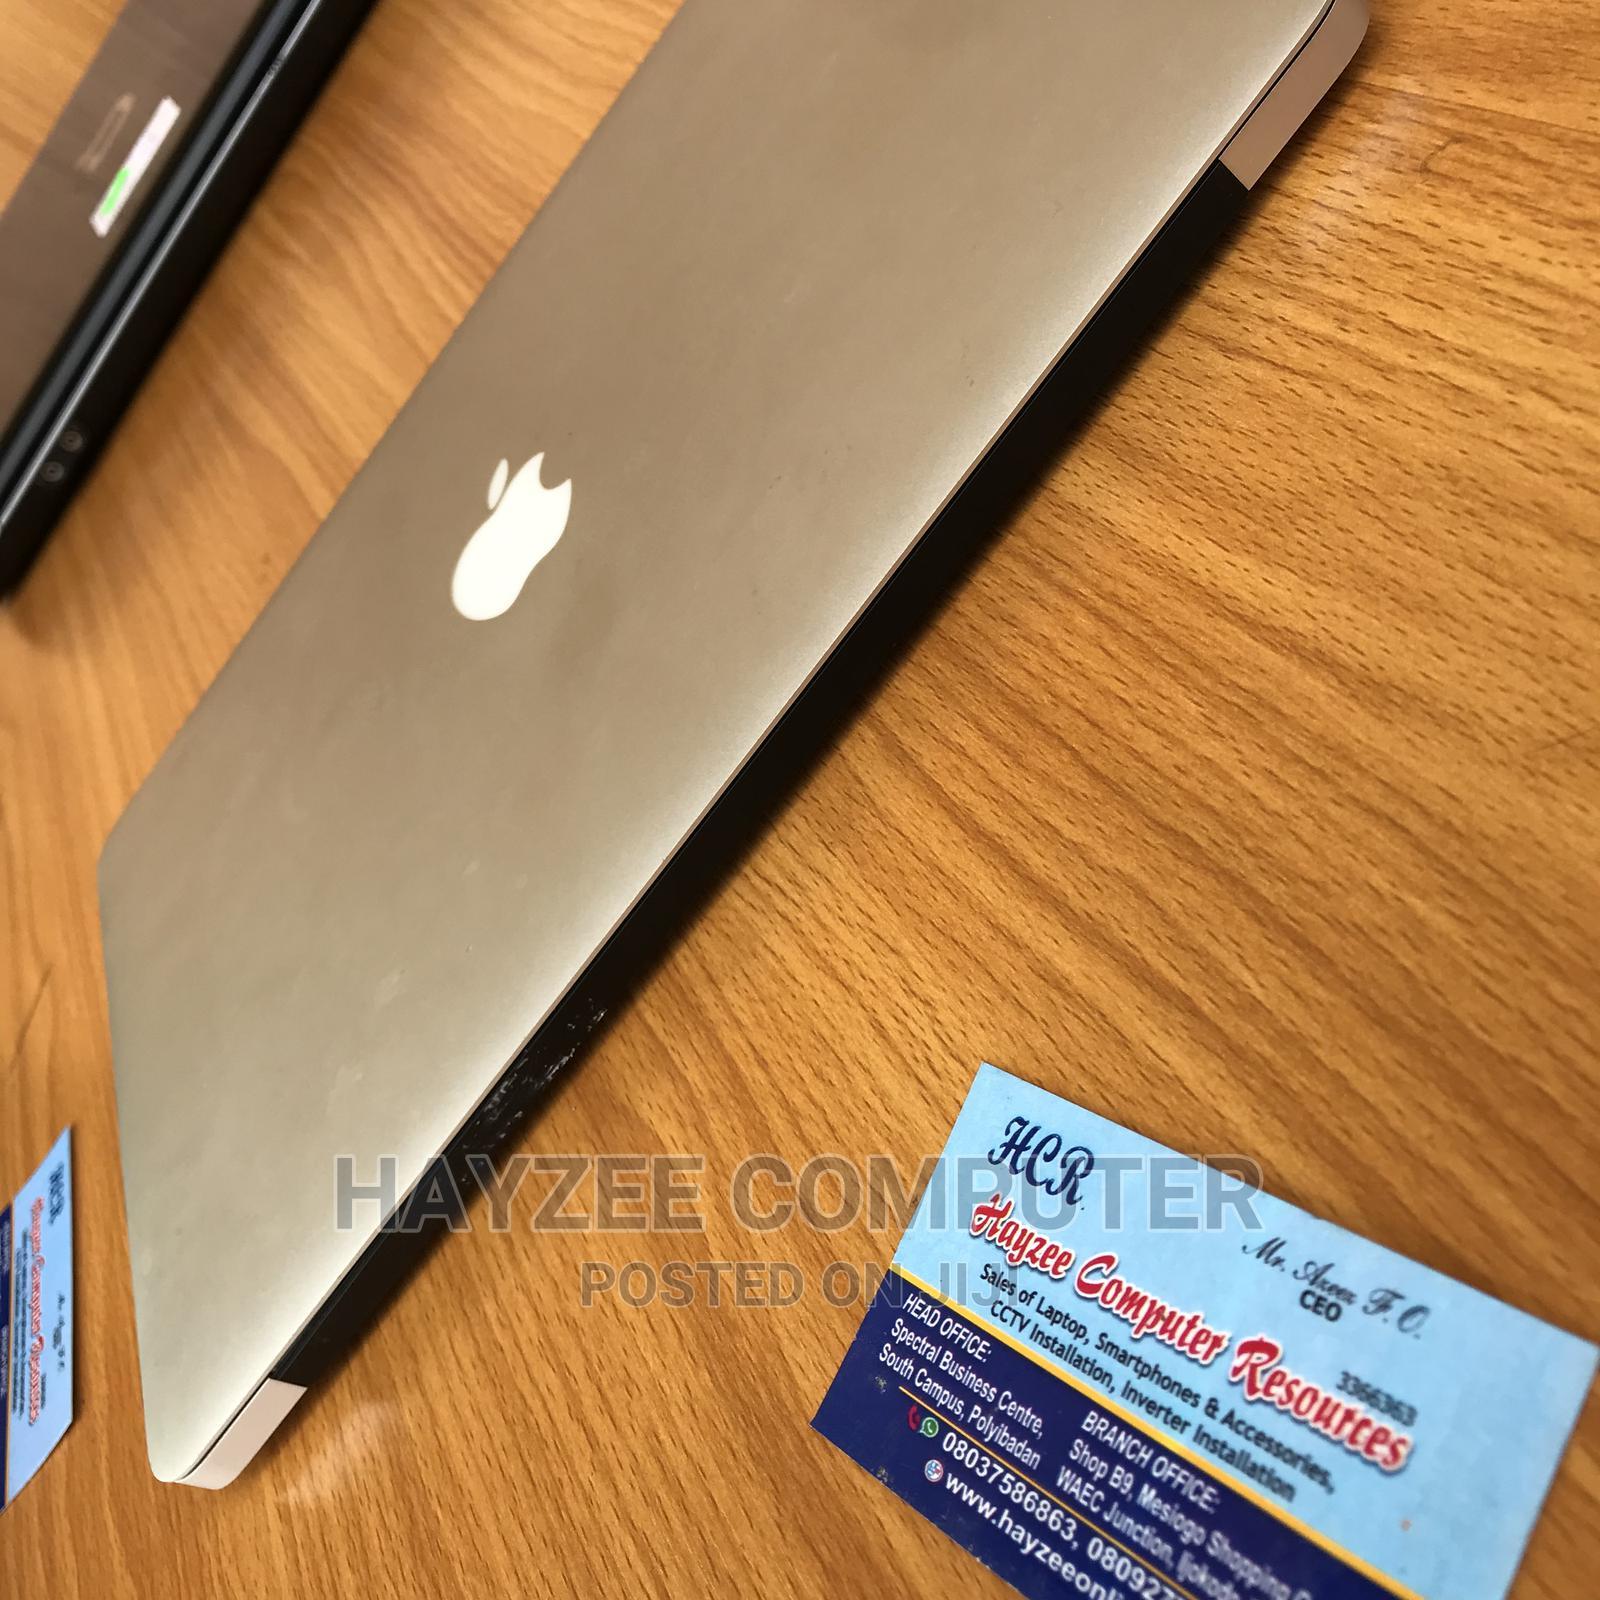 Laptop Apple MacBook Air 2012 4GB Intel Core I5 SSD 128GB | Laptops & Computers for sale in Ibadan, Oyo State, Nigeria